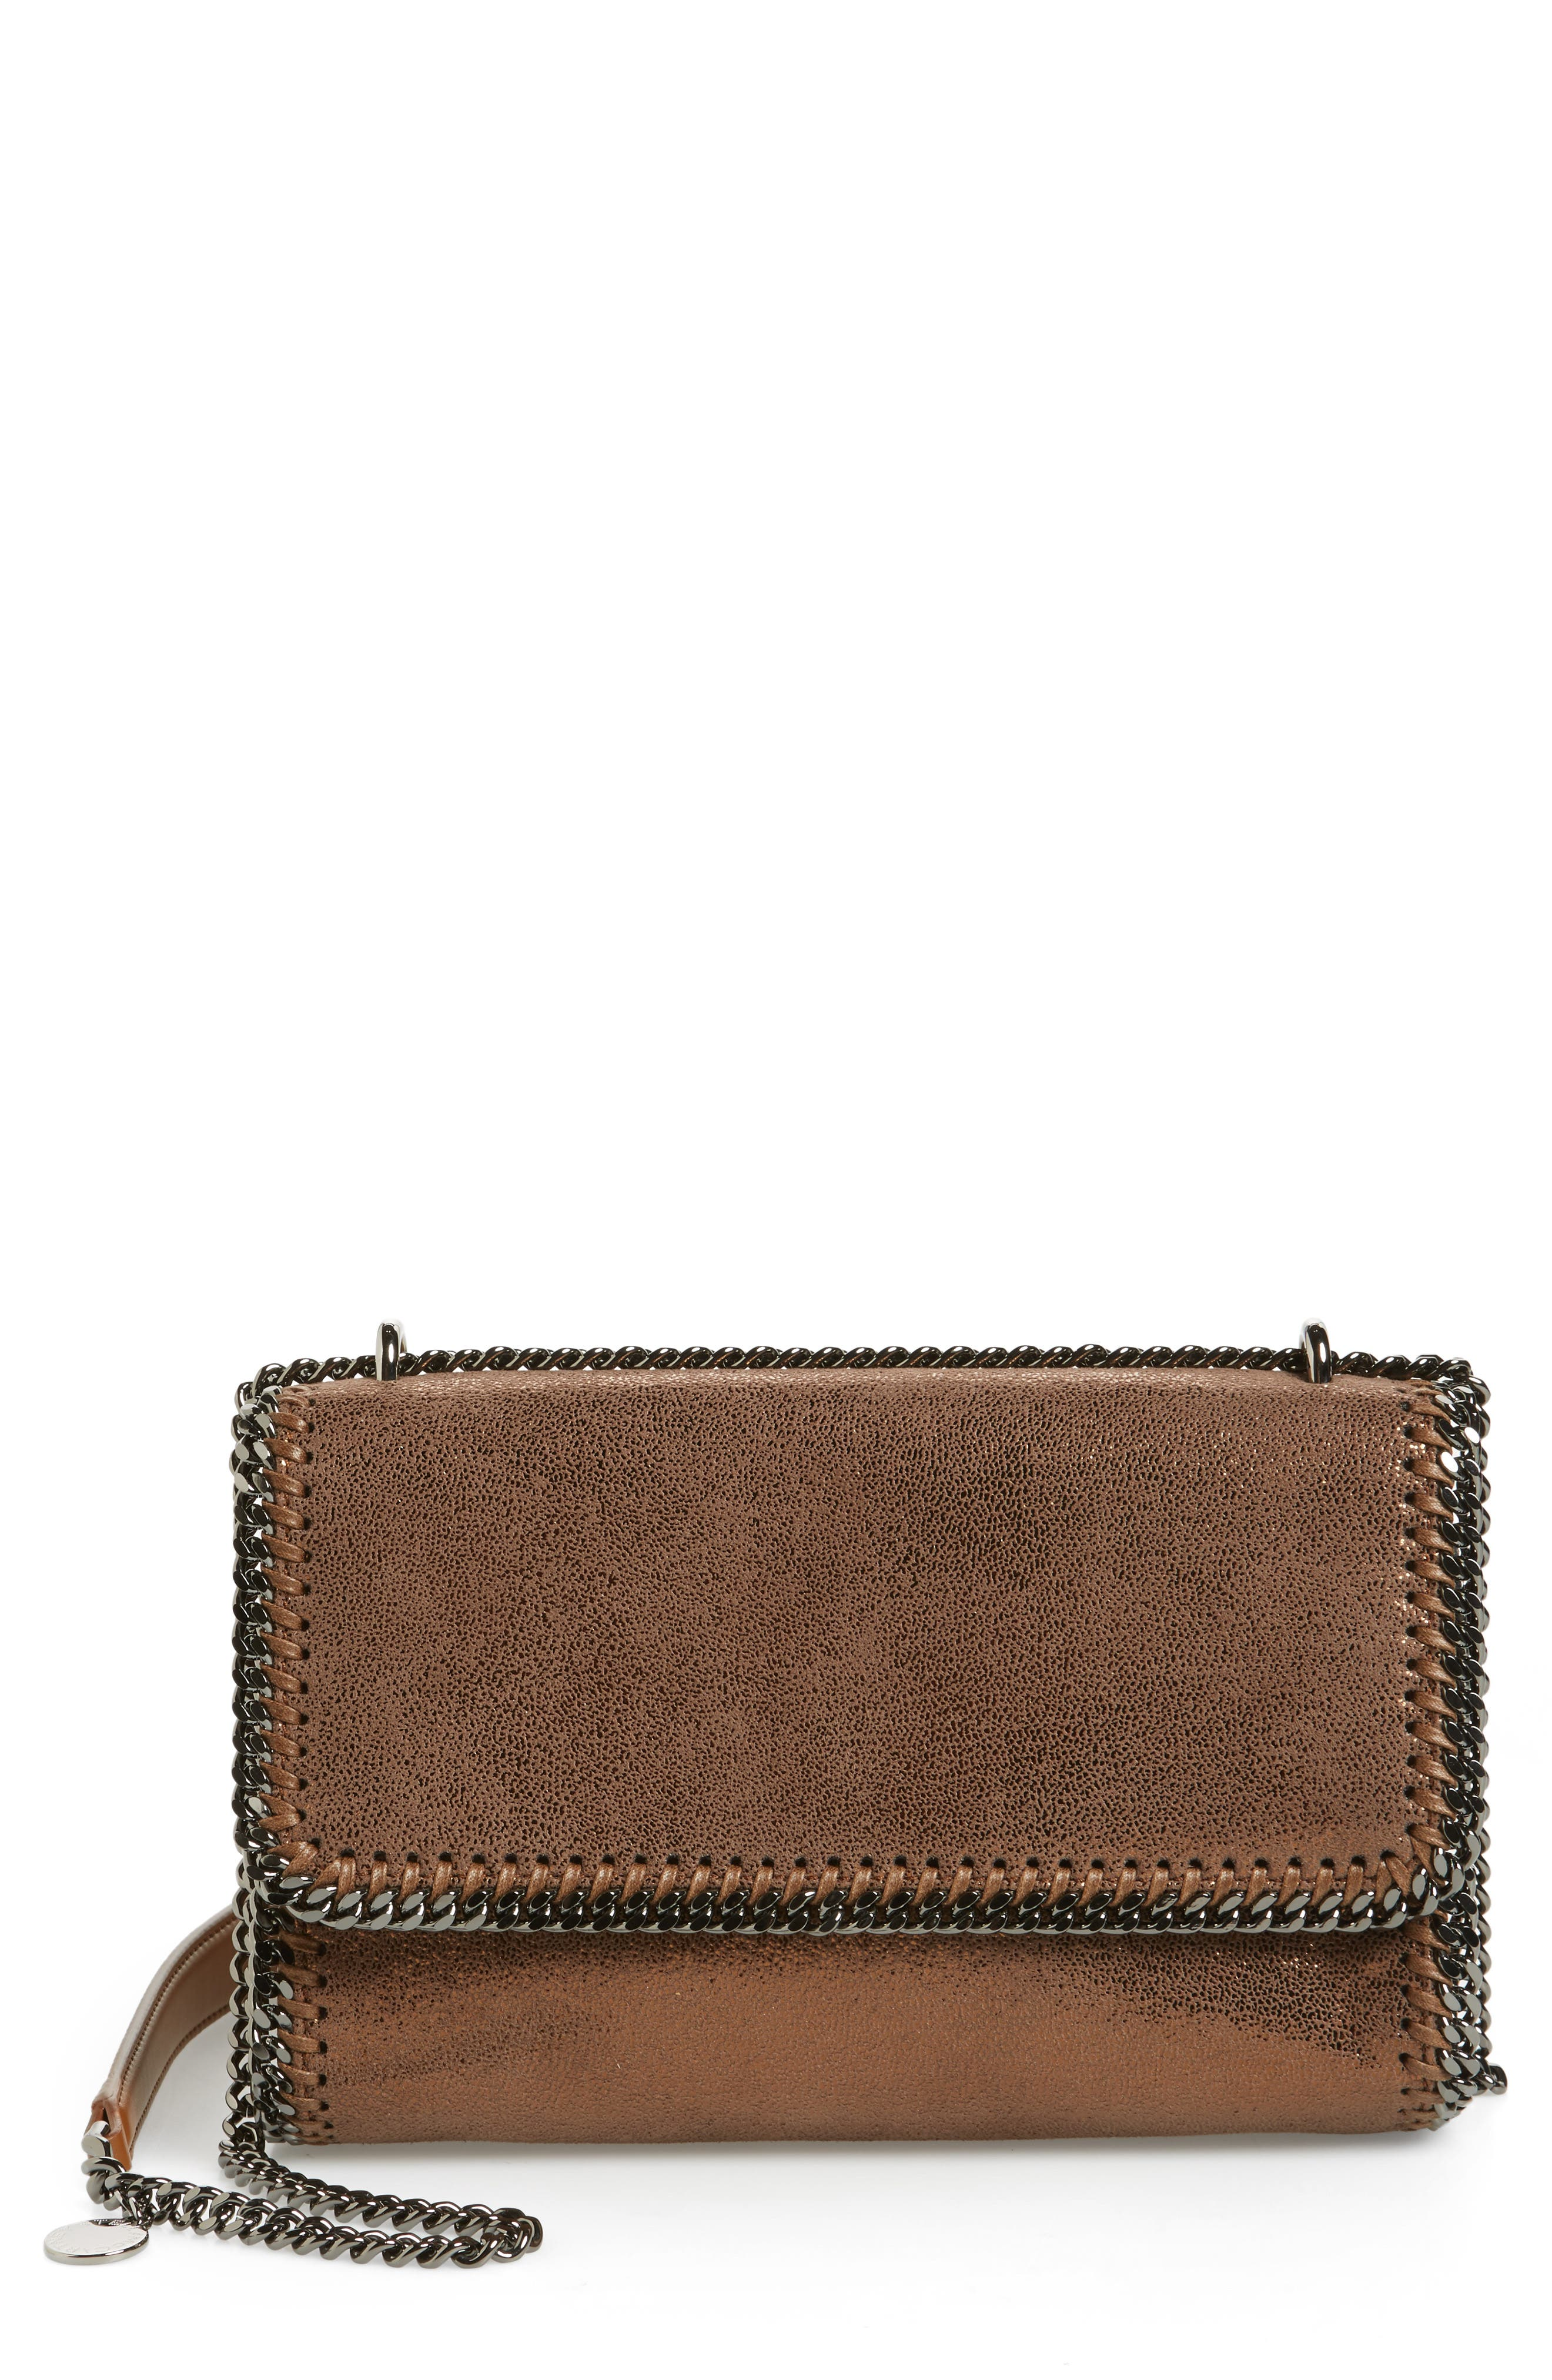 Falabella Metallic Faux Leather Convertible Shoulder Bag,                             Main thumbnail 1, color,                             200